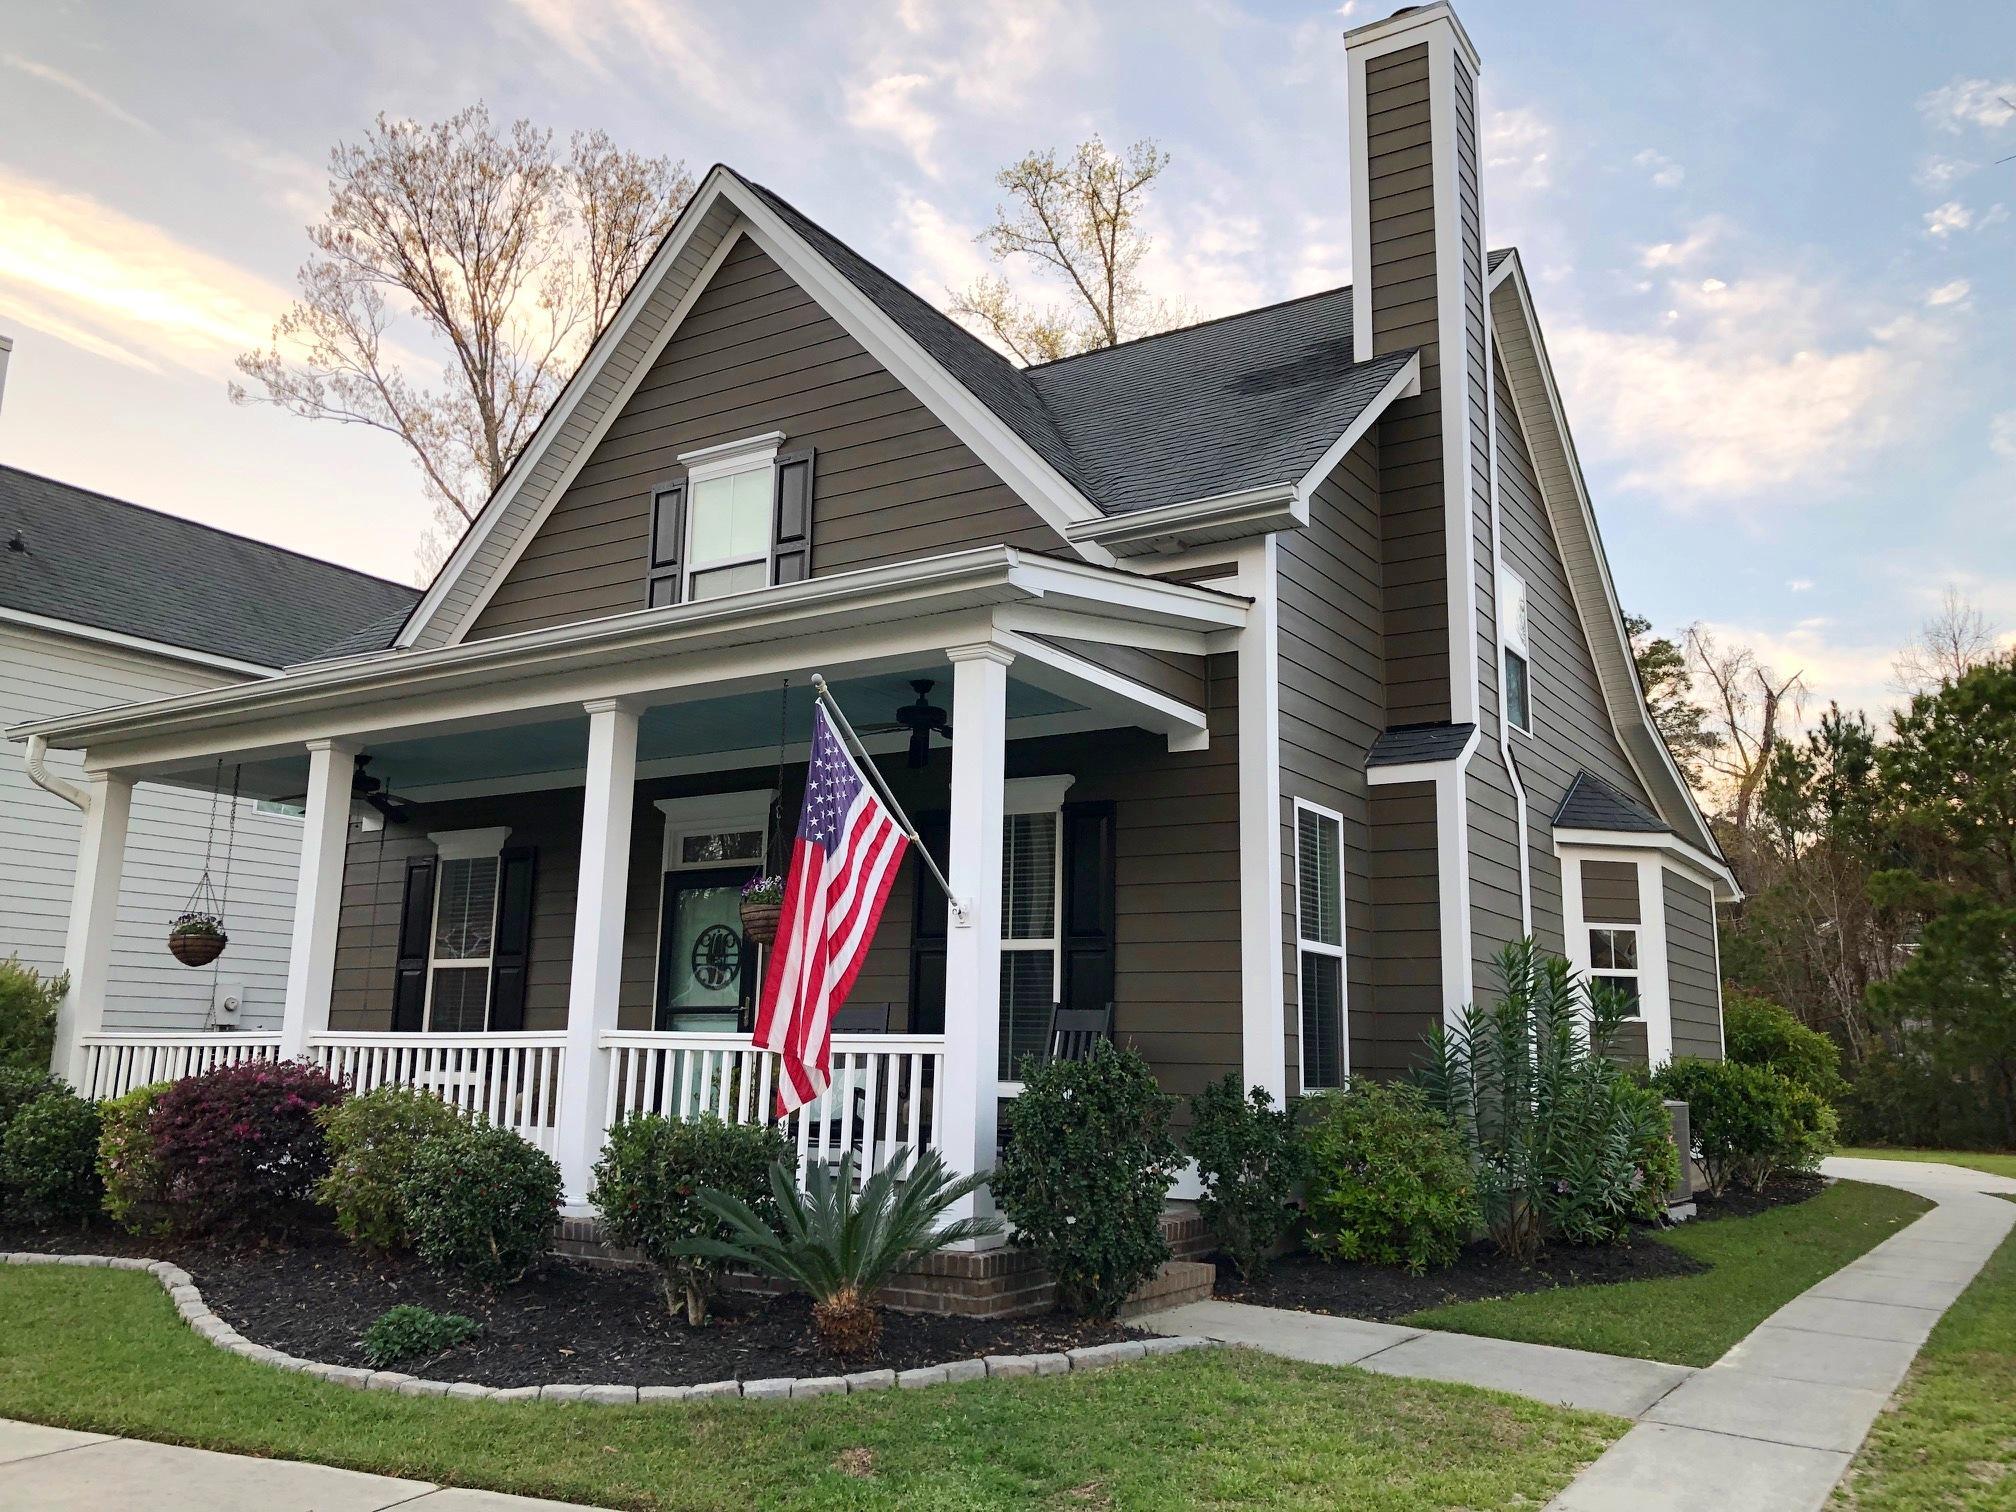 Carol Oaks Homes For Sale - 1316 Carol Oaks, Mount Pleasant, SC - 9